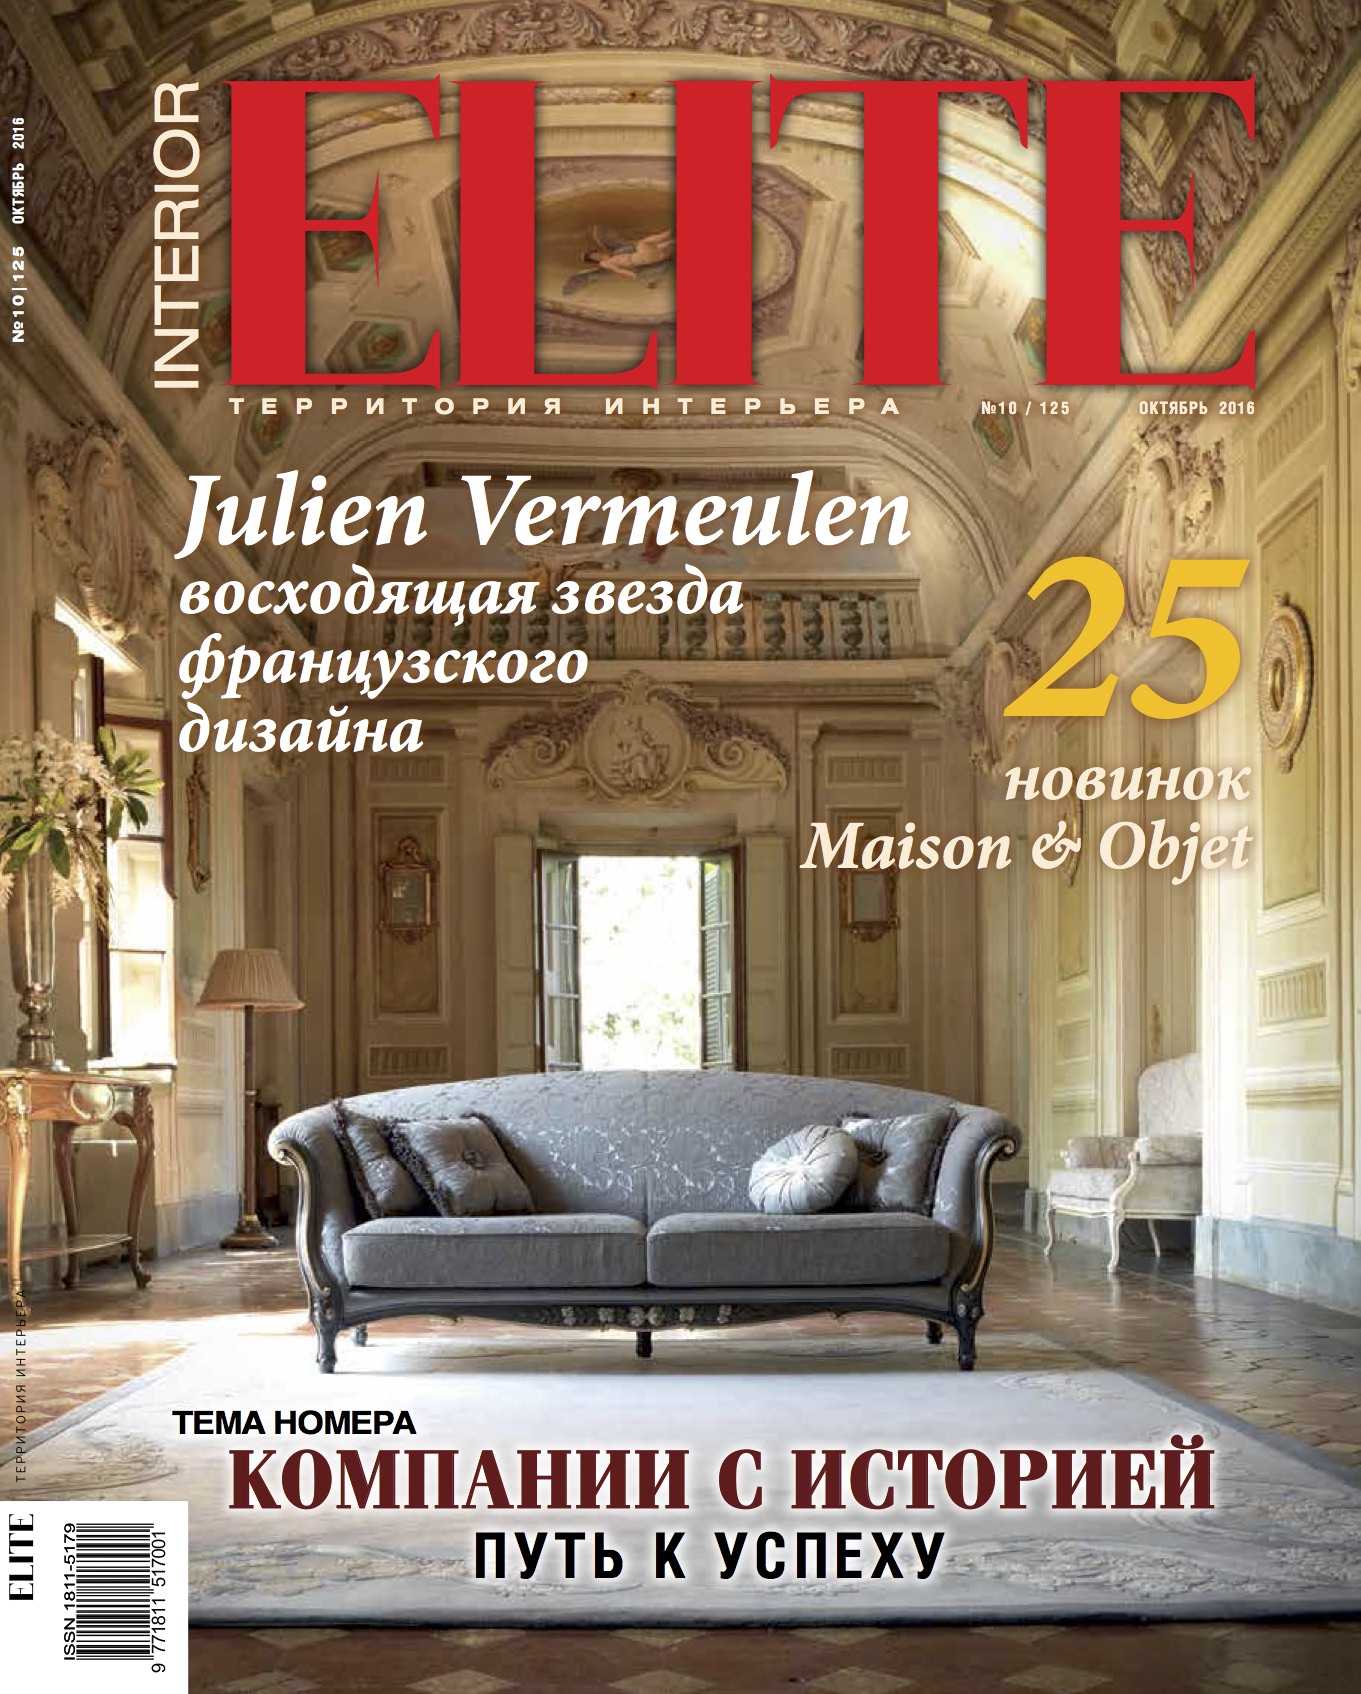 ELITE front cover Oct 2016.jpg